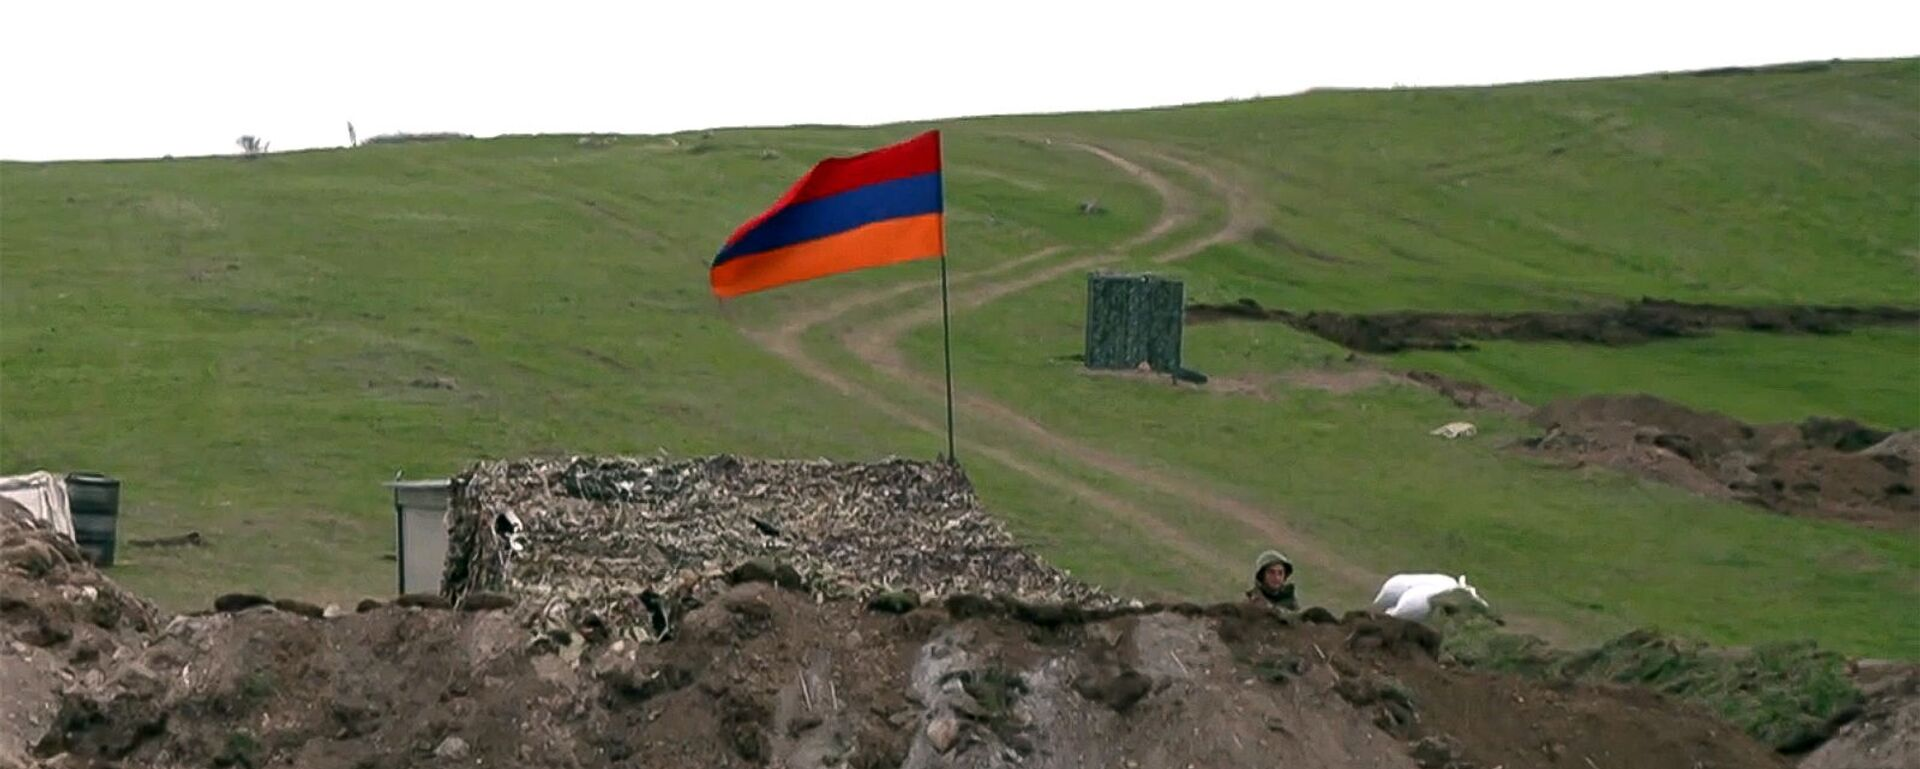 Армянский военнослужащий на армяно-азербайджанской границе - Sputnik Արմենիա, 1920, 20.07.2021